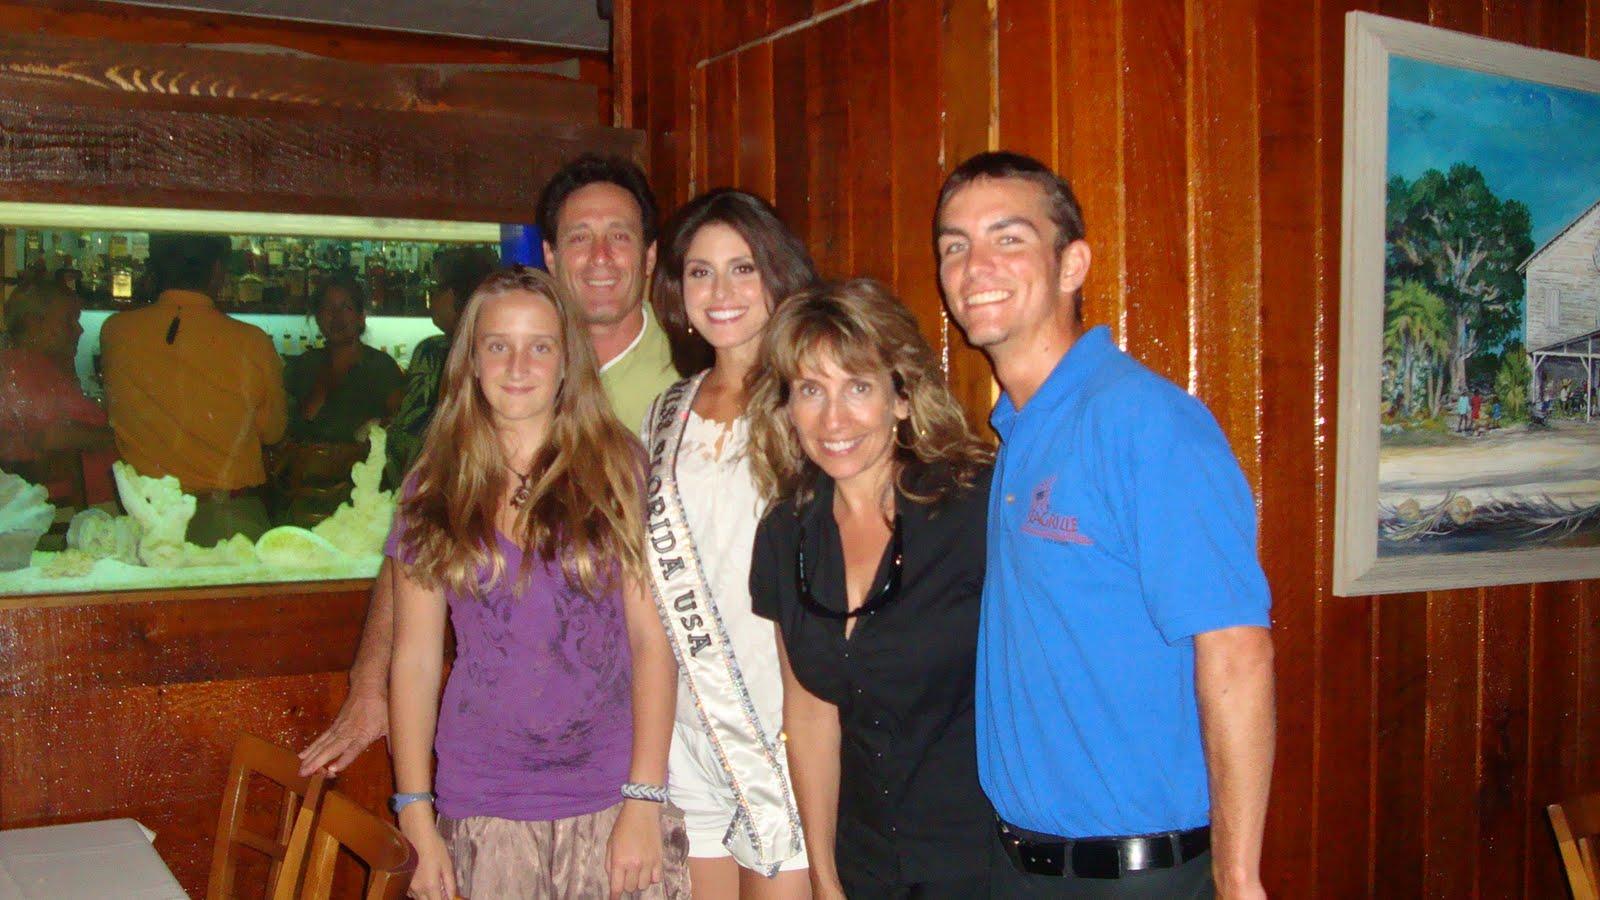 Miss Florida USA 2010 - Megan Clementi DSC01922